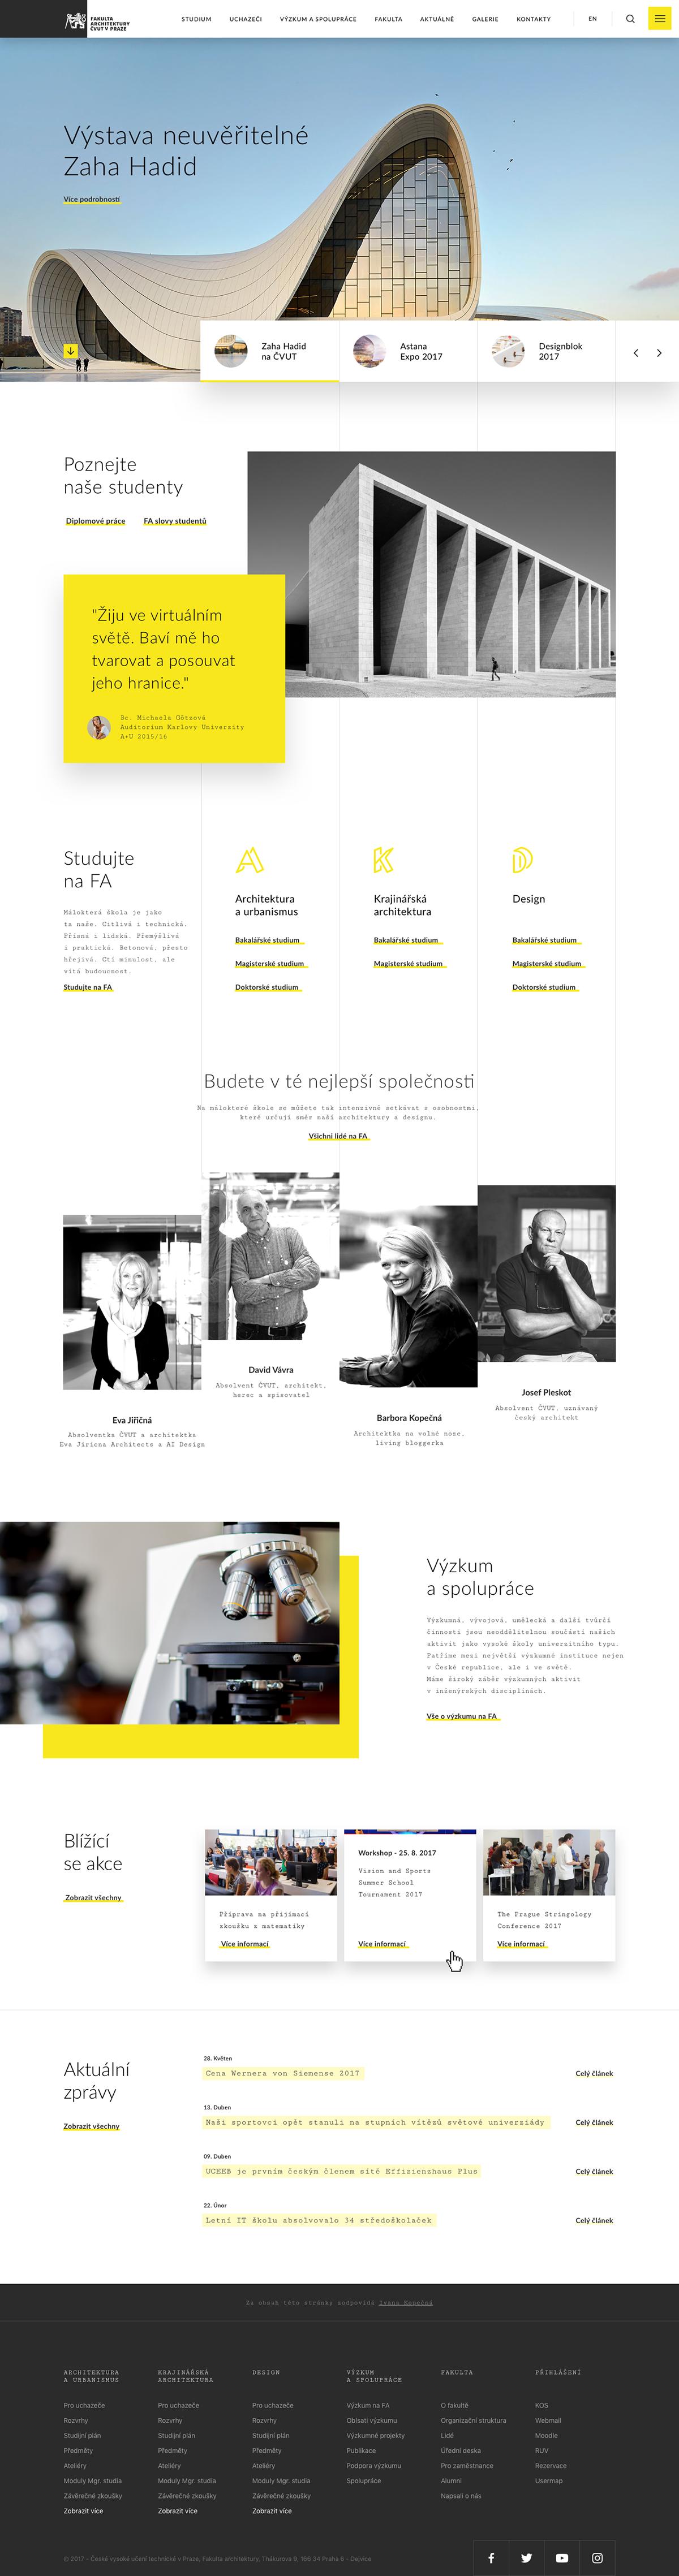 ui design,UX design,Webdesign,interaction,architectur,Minimalism,sdmk,CVUT,University,technical